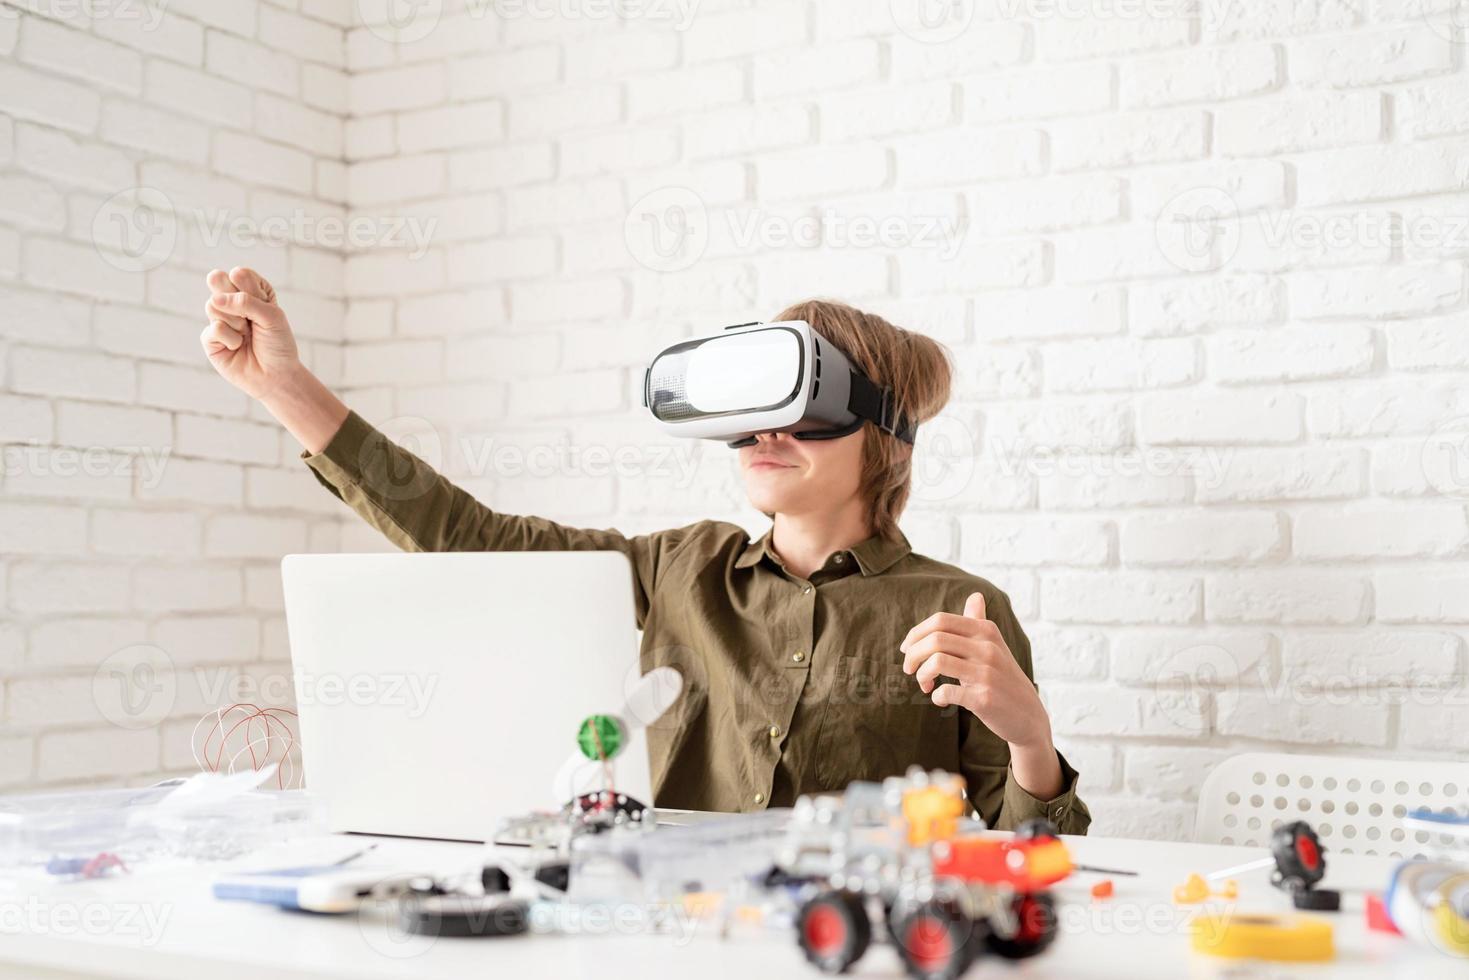 menino adolescente sorridente usando óculos de realidade virtual jogando o jogo foto